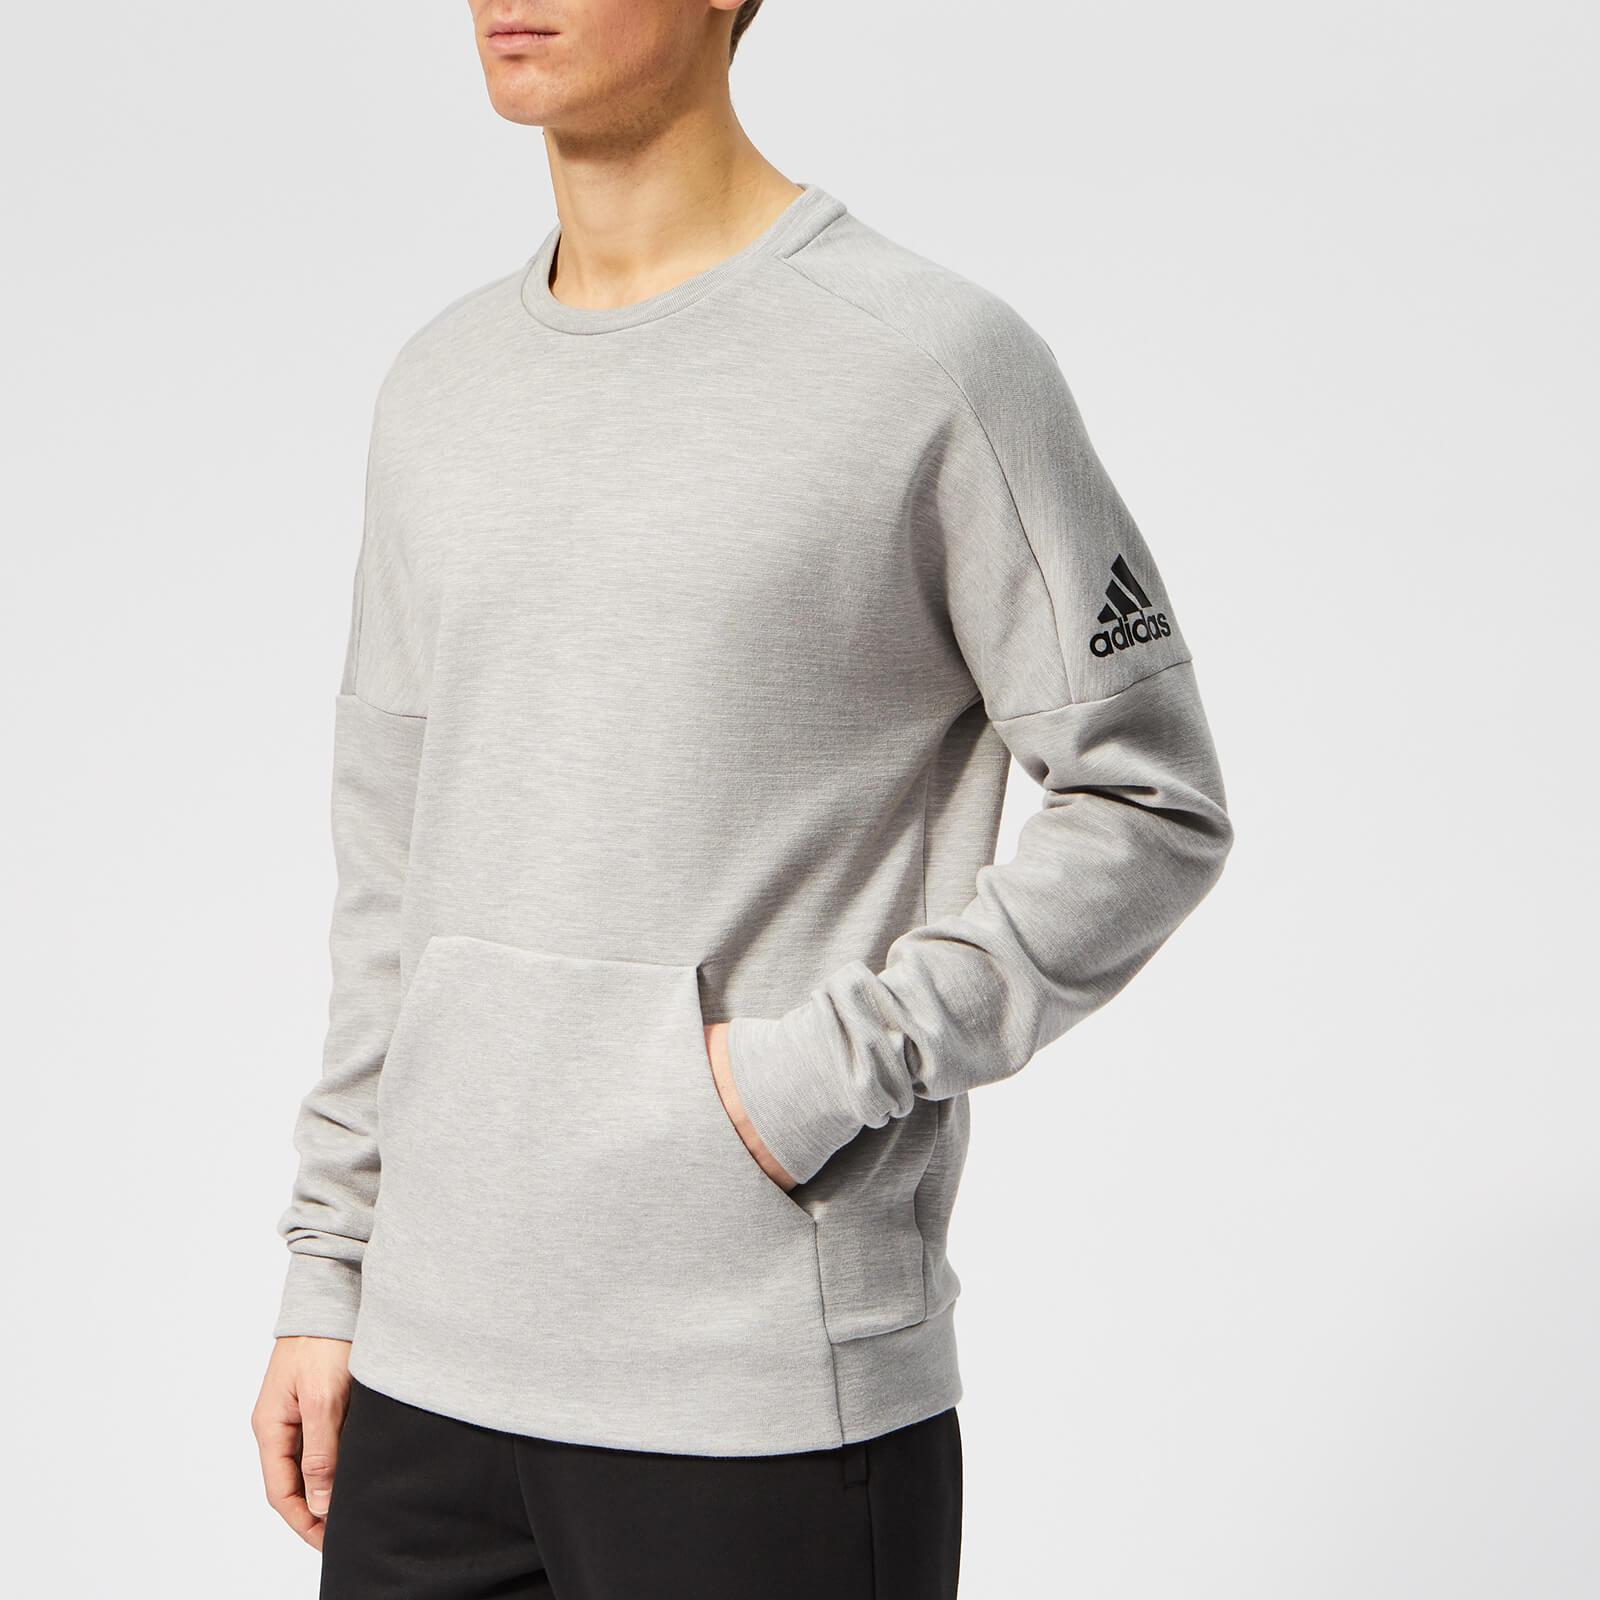 adidas Men's ID Stadium Crew Neck Sweatshirt - Grey Heather - XL - Grey